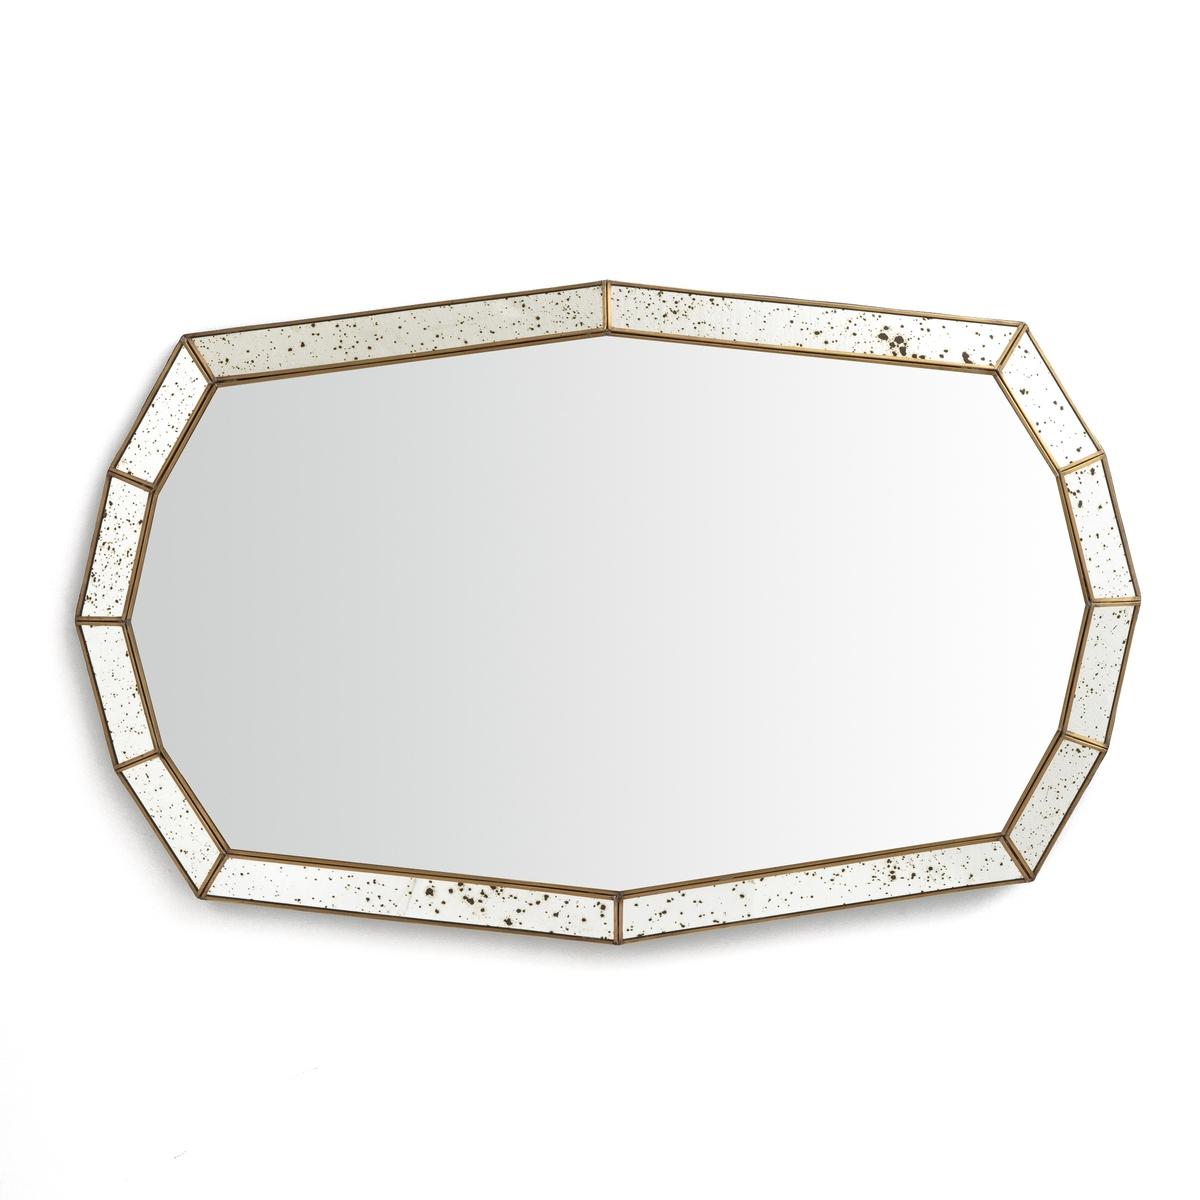 Зеркало, В.90 см la maison blanche la nuitрепродукции ван гога 75 x 30см